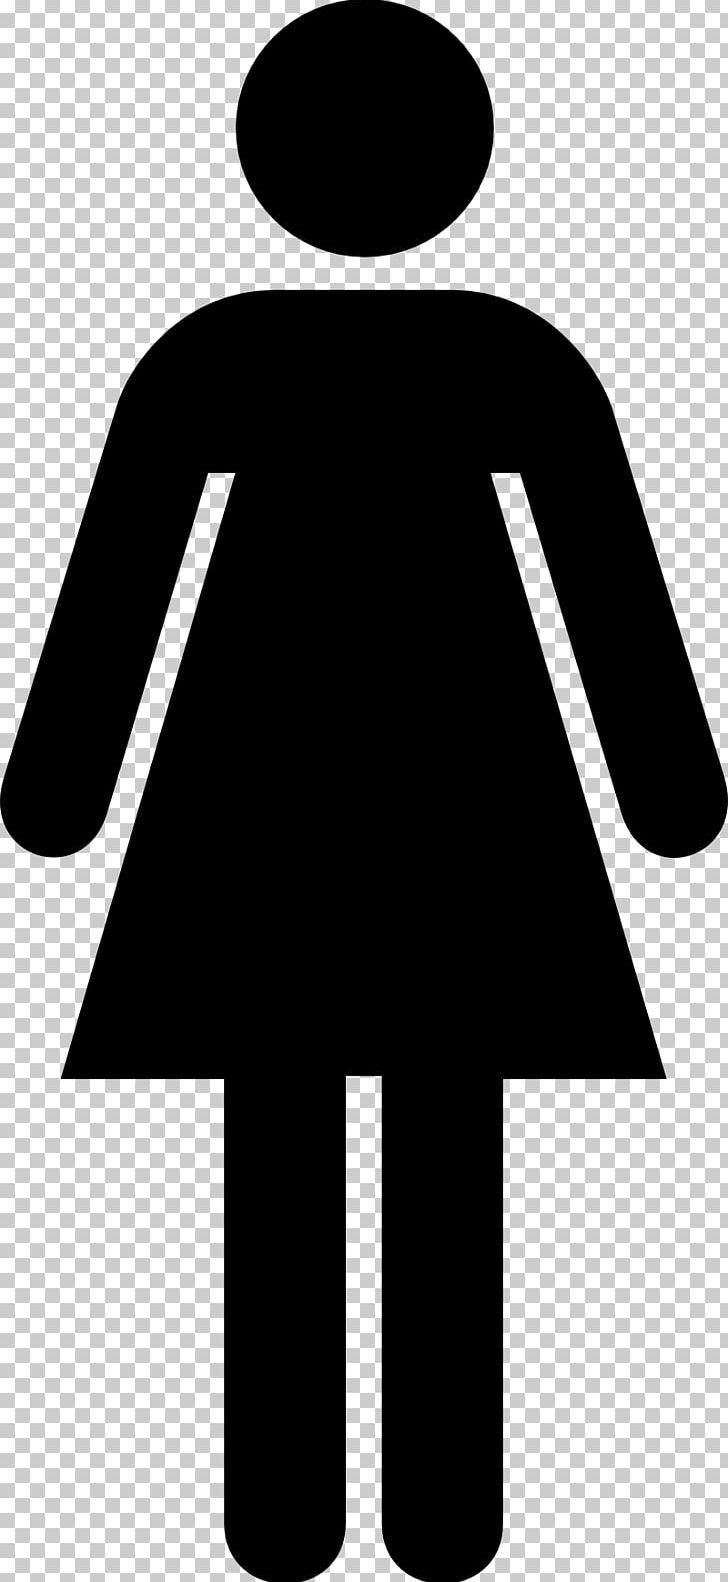 Black female politician clipart jpg freeuse download Public Toilet Bathroom Female Woman PNG, Clipart, Angle, Bathroom ... jpg freeuse download